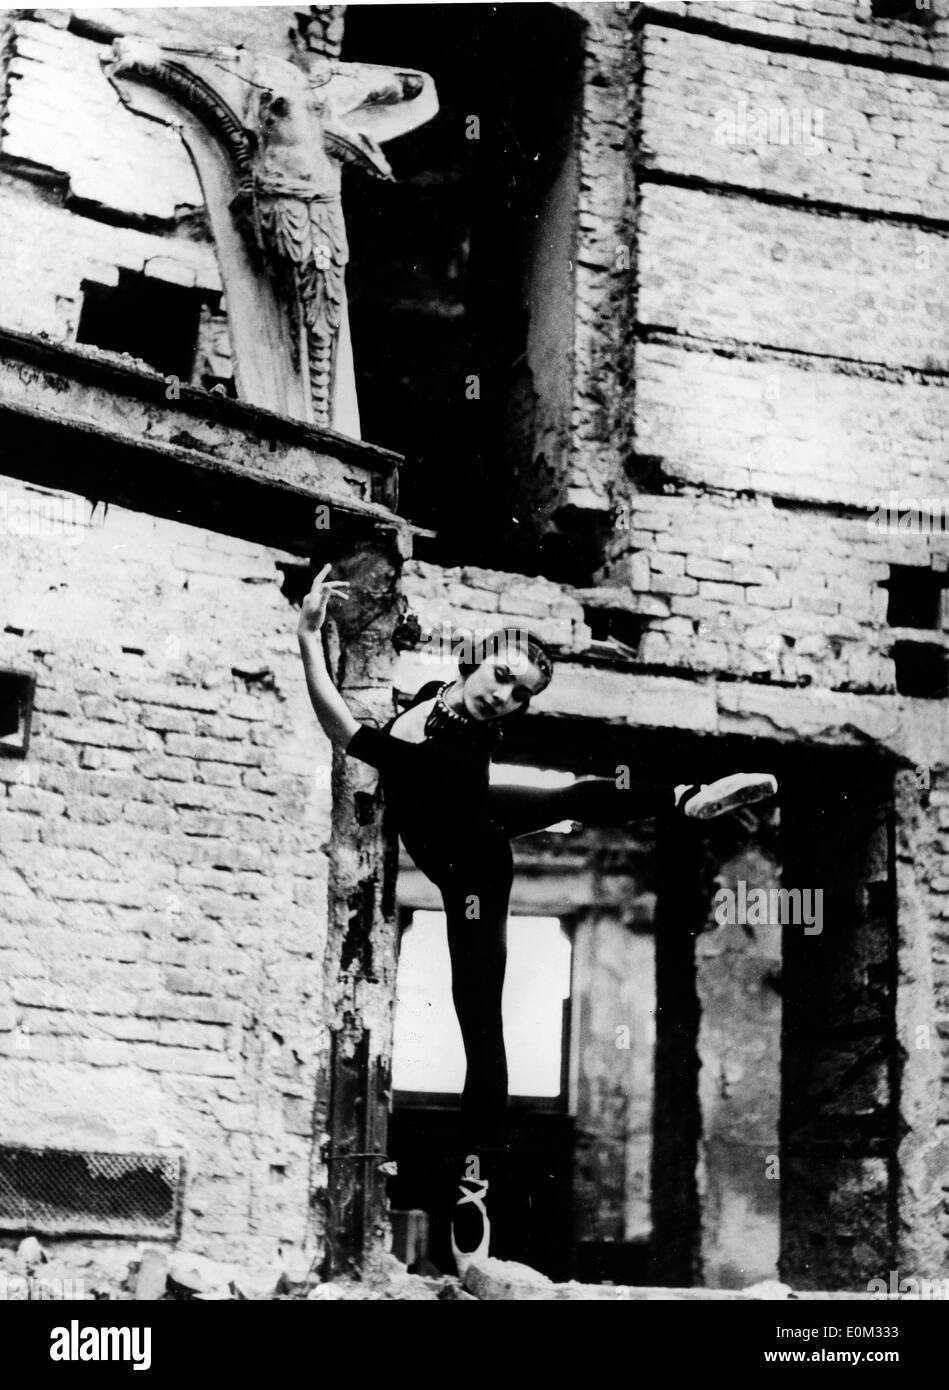 Veronika Mlakar doing ballet at a large house destroyed by bombing - Stock Image